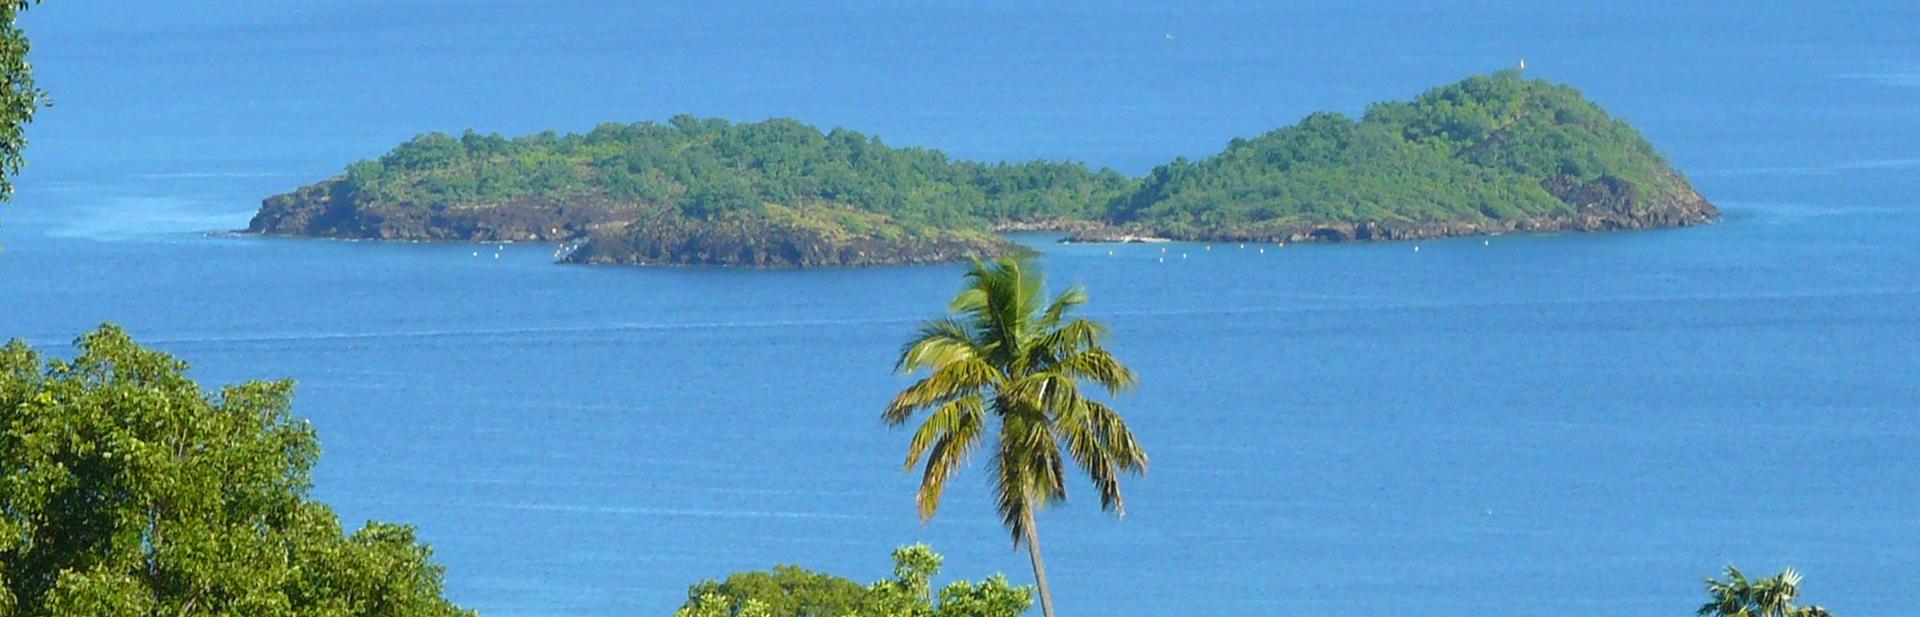 activitees-bouillante-basse-terre-guadeloupe-gite-bungalow-cabazat-creole